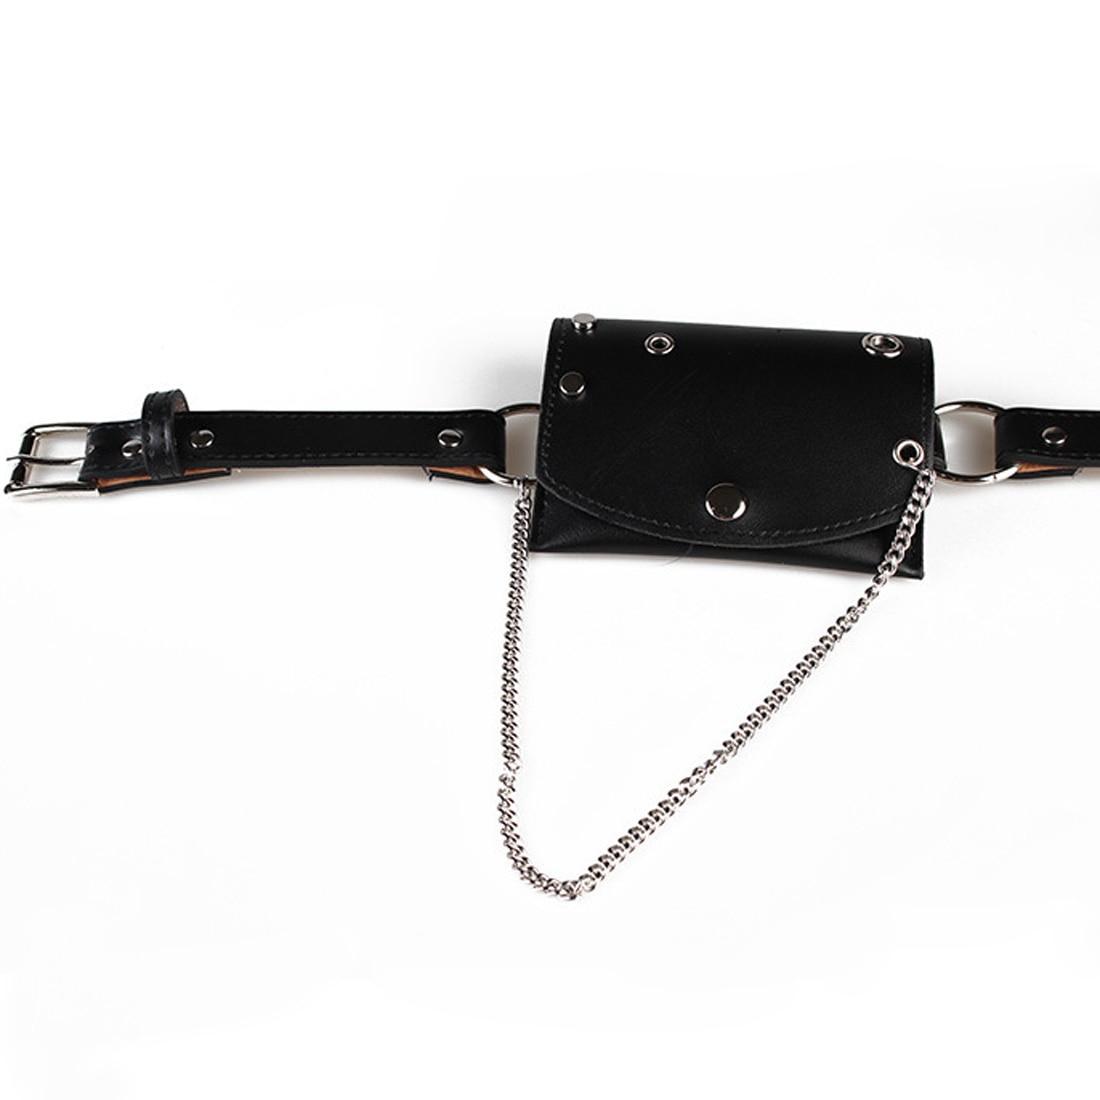 00b9f89564 Fashion New Waist Bags For Women Girls Metal Round Hole Rivet Thin ...